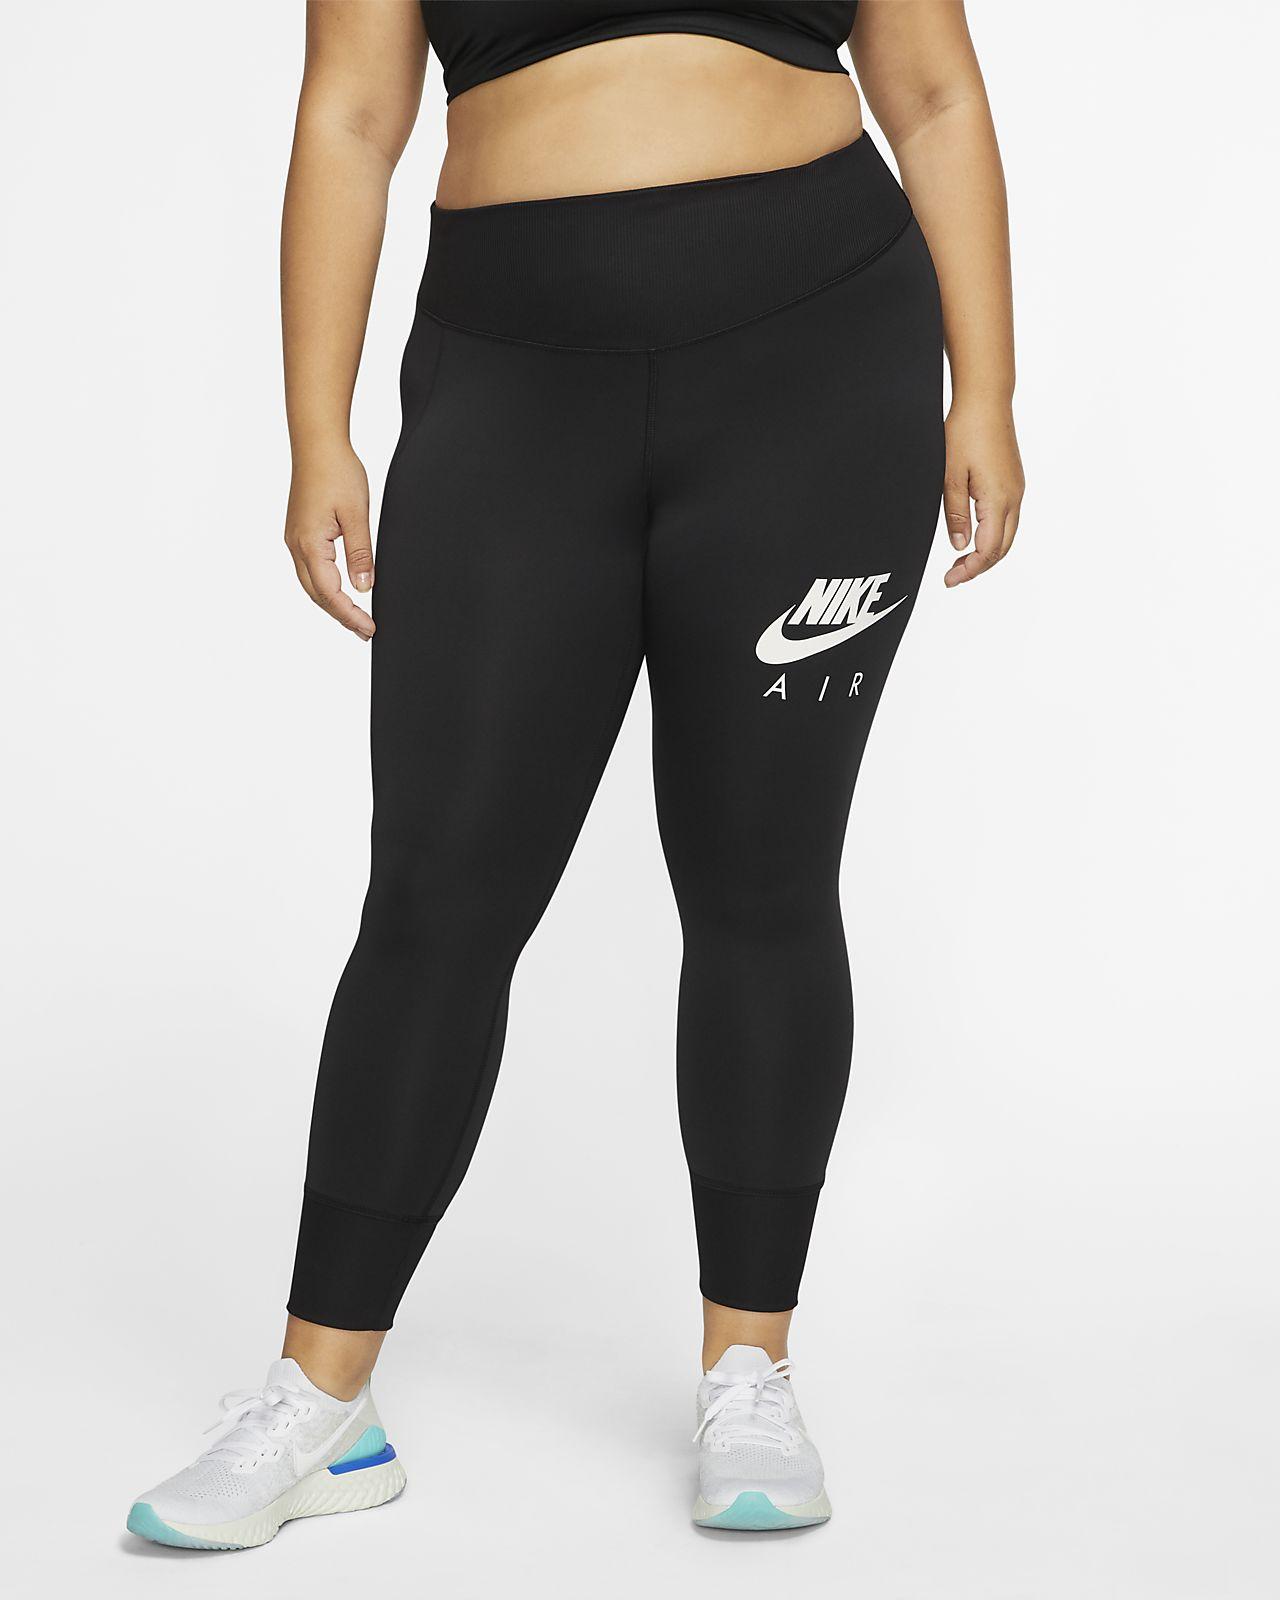 Nike Fast 7/8 løpetights til dame (store størrelser)